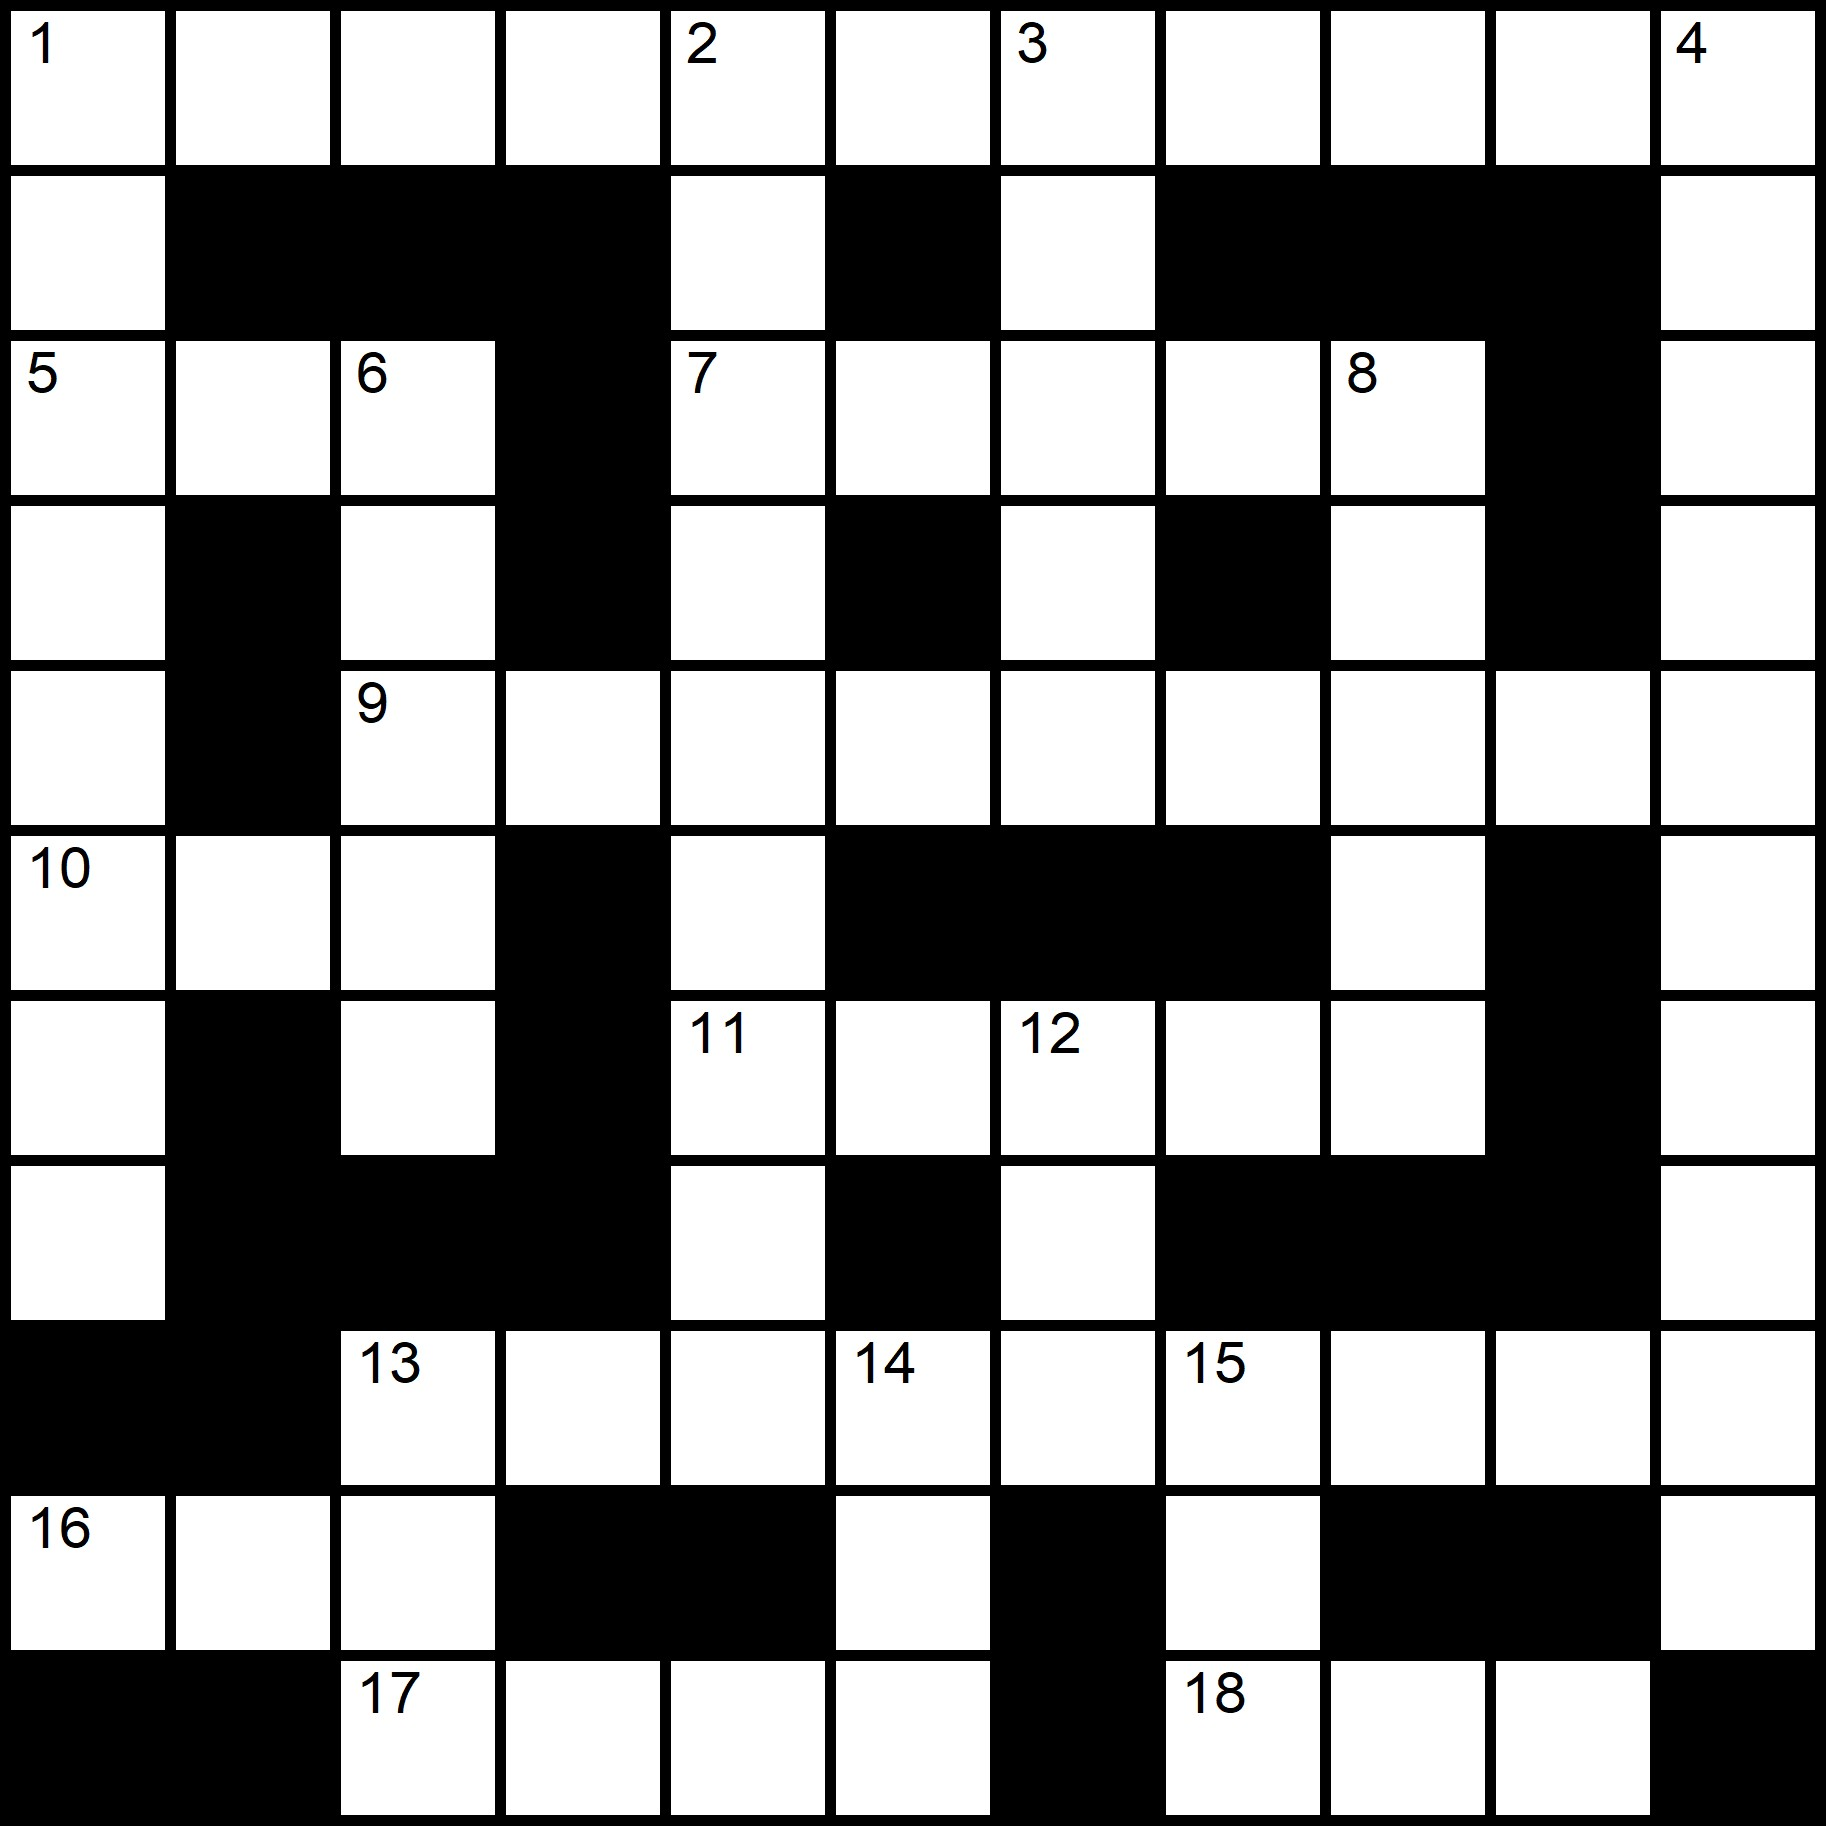 Printable Crossword Puzzles Free With Answer Key - Placidus Flora - Crossword number twenty-nine